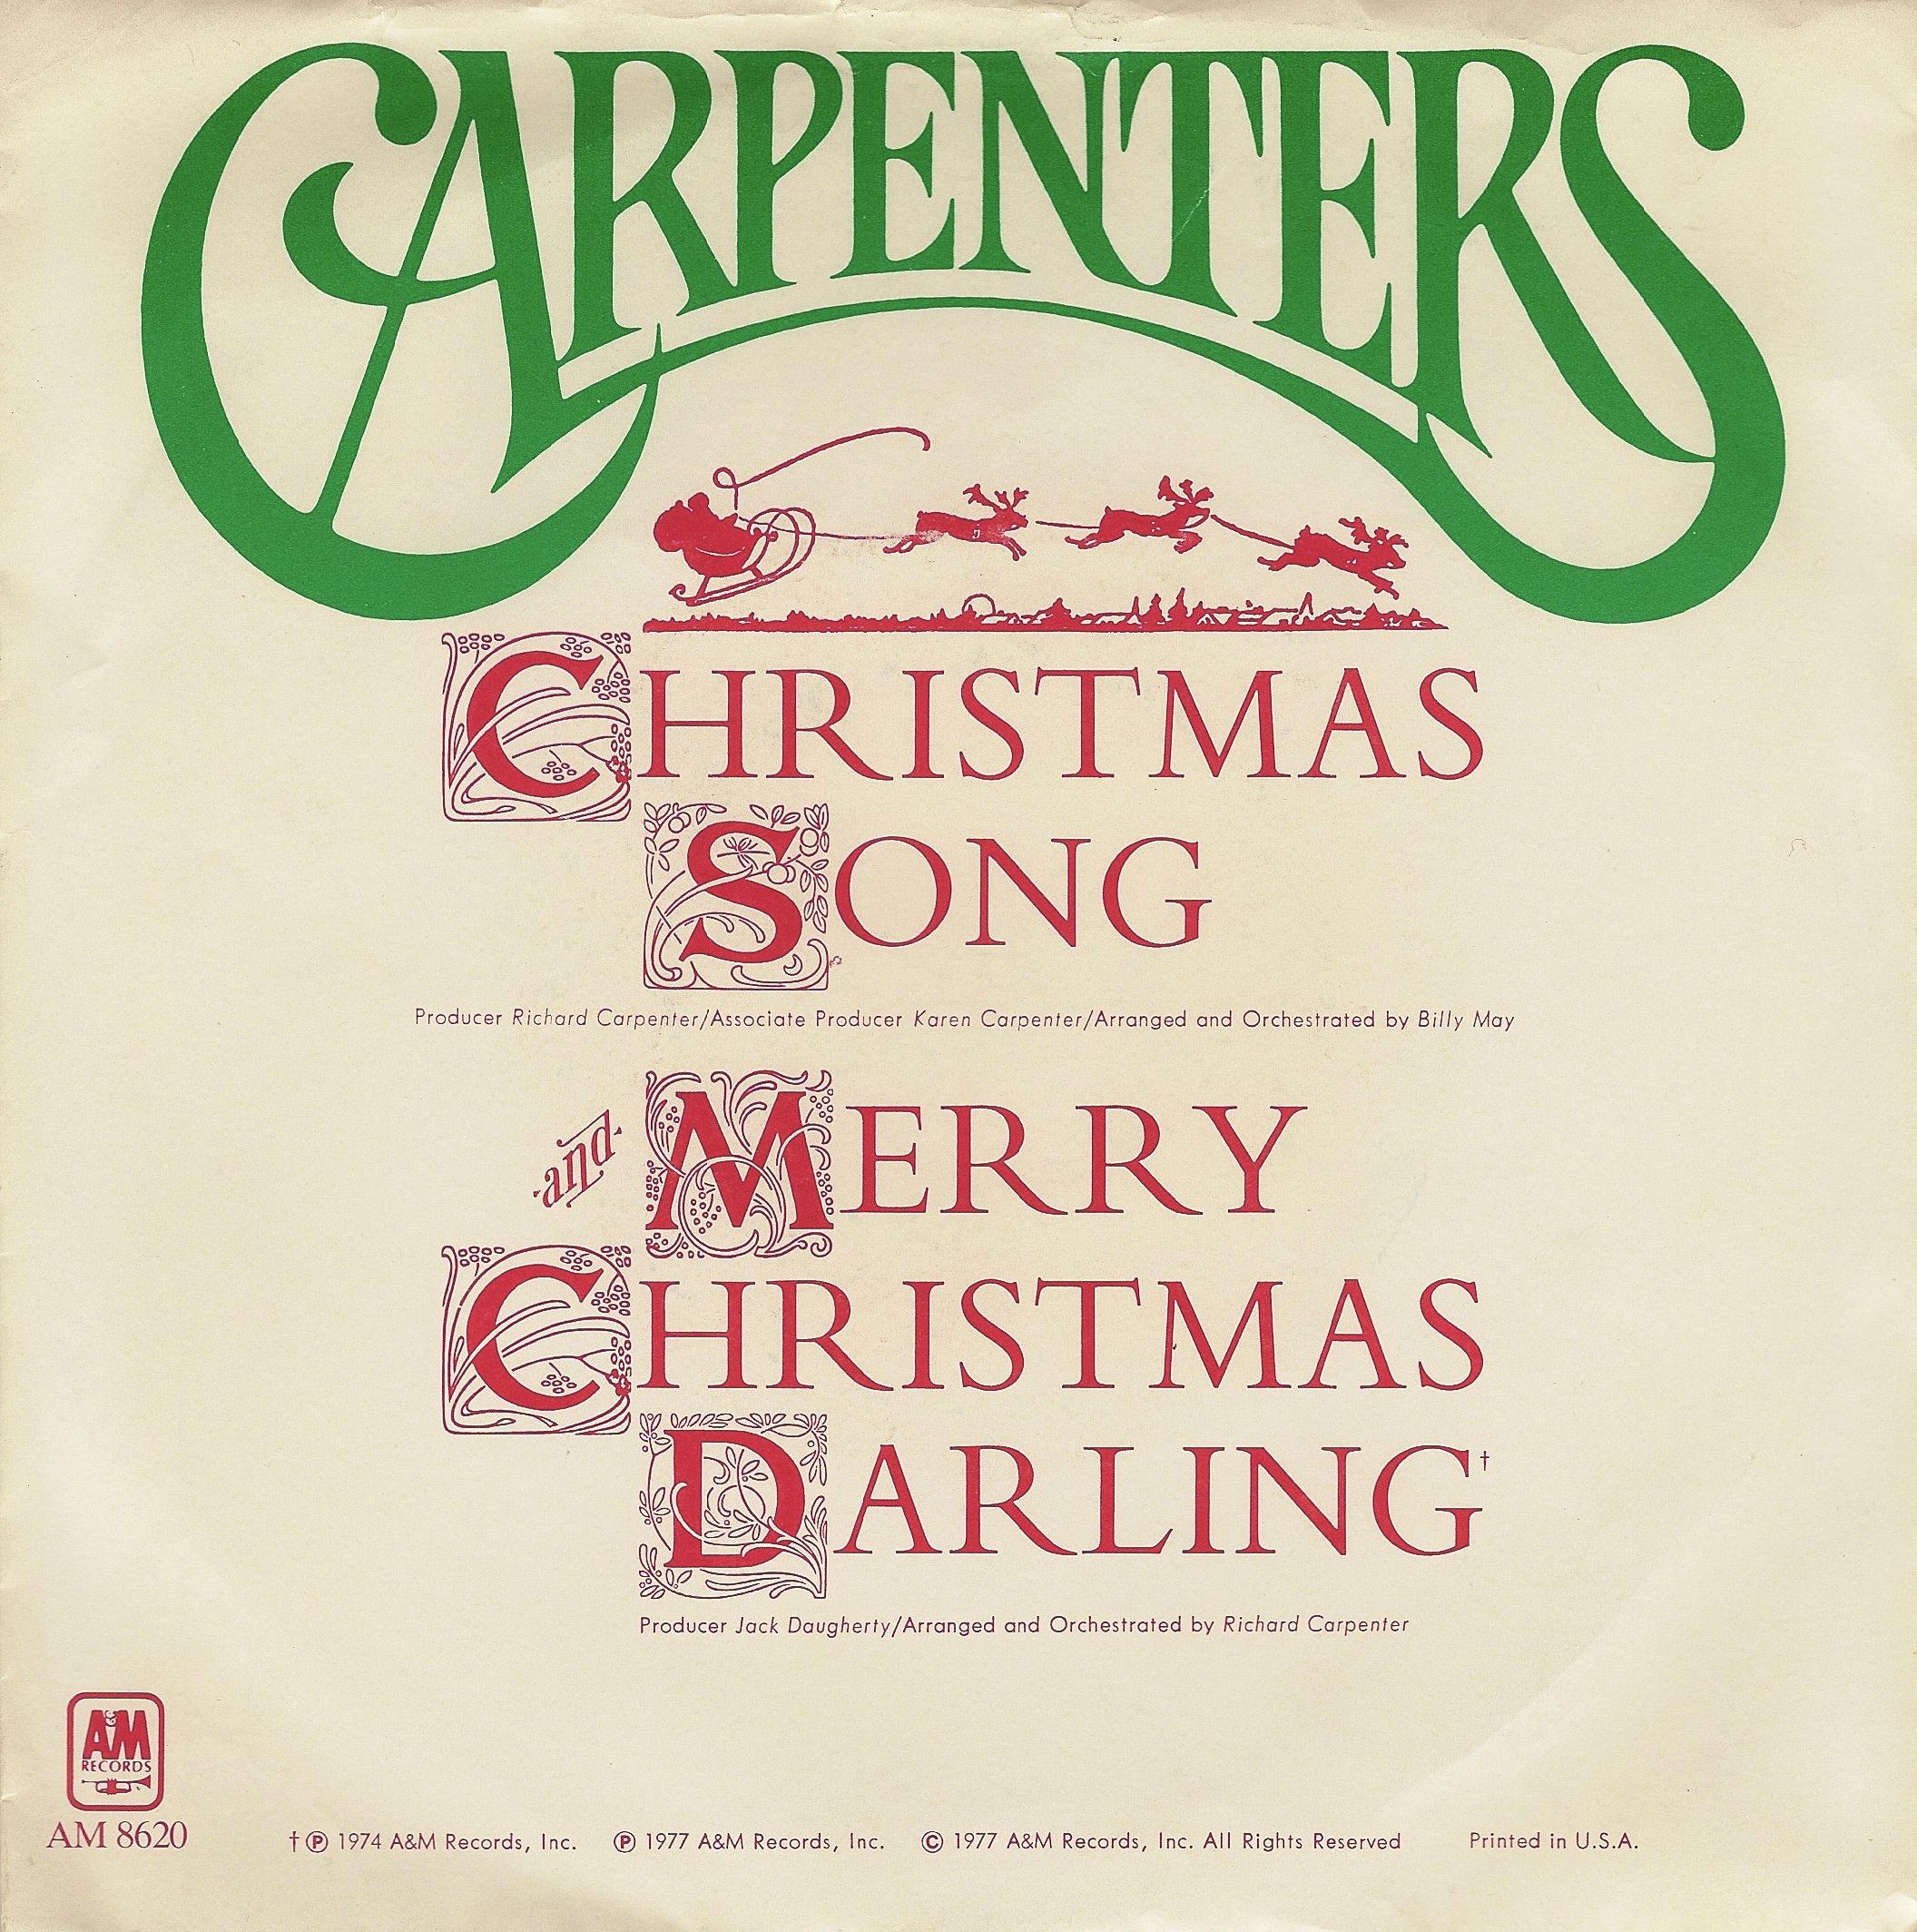 Merry Christmas Darling.The Adventurers Club Carpenters Merry Christmas Darling